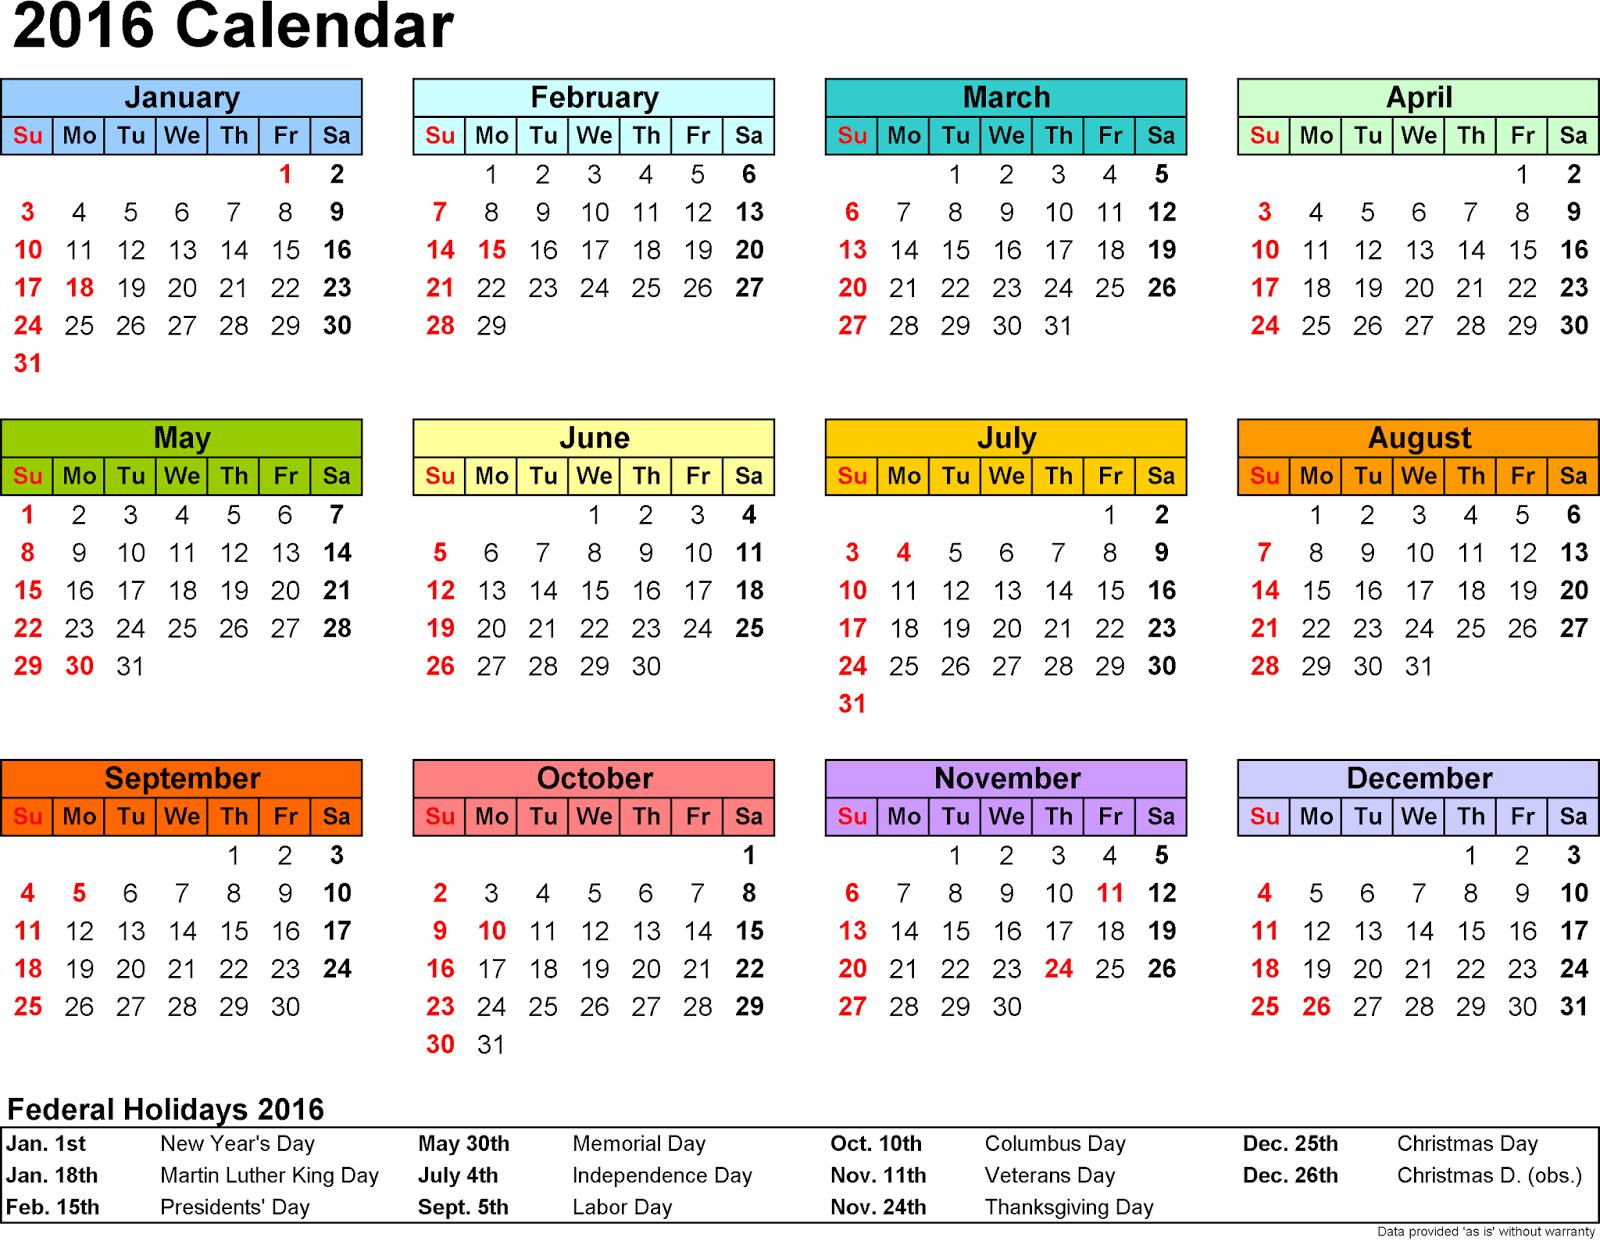 Free cute printable calendar 2016 for How to make a cute calendar